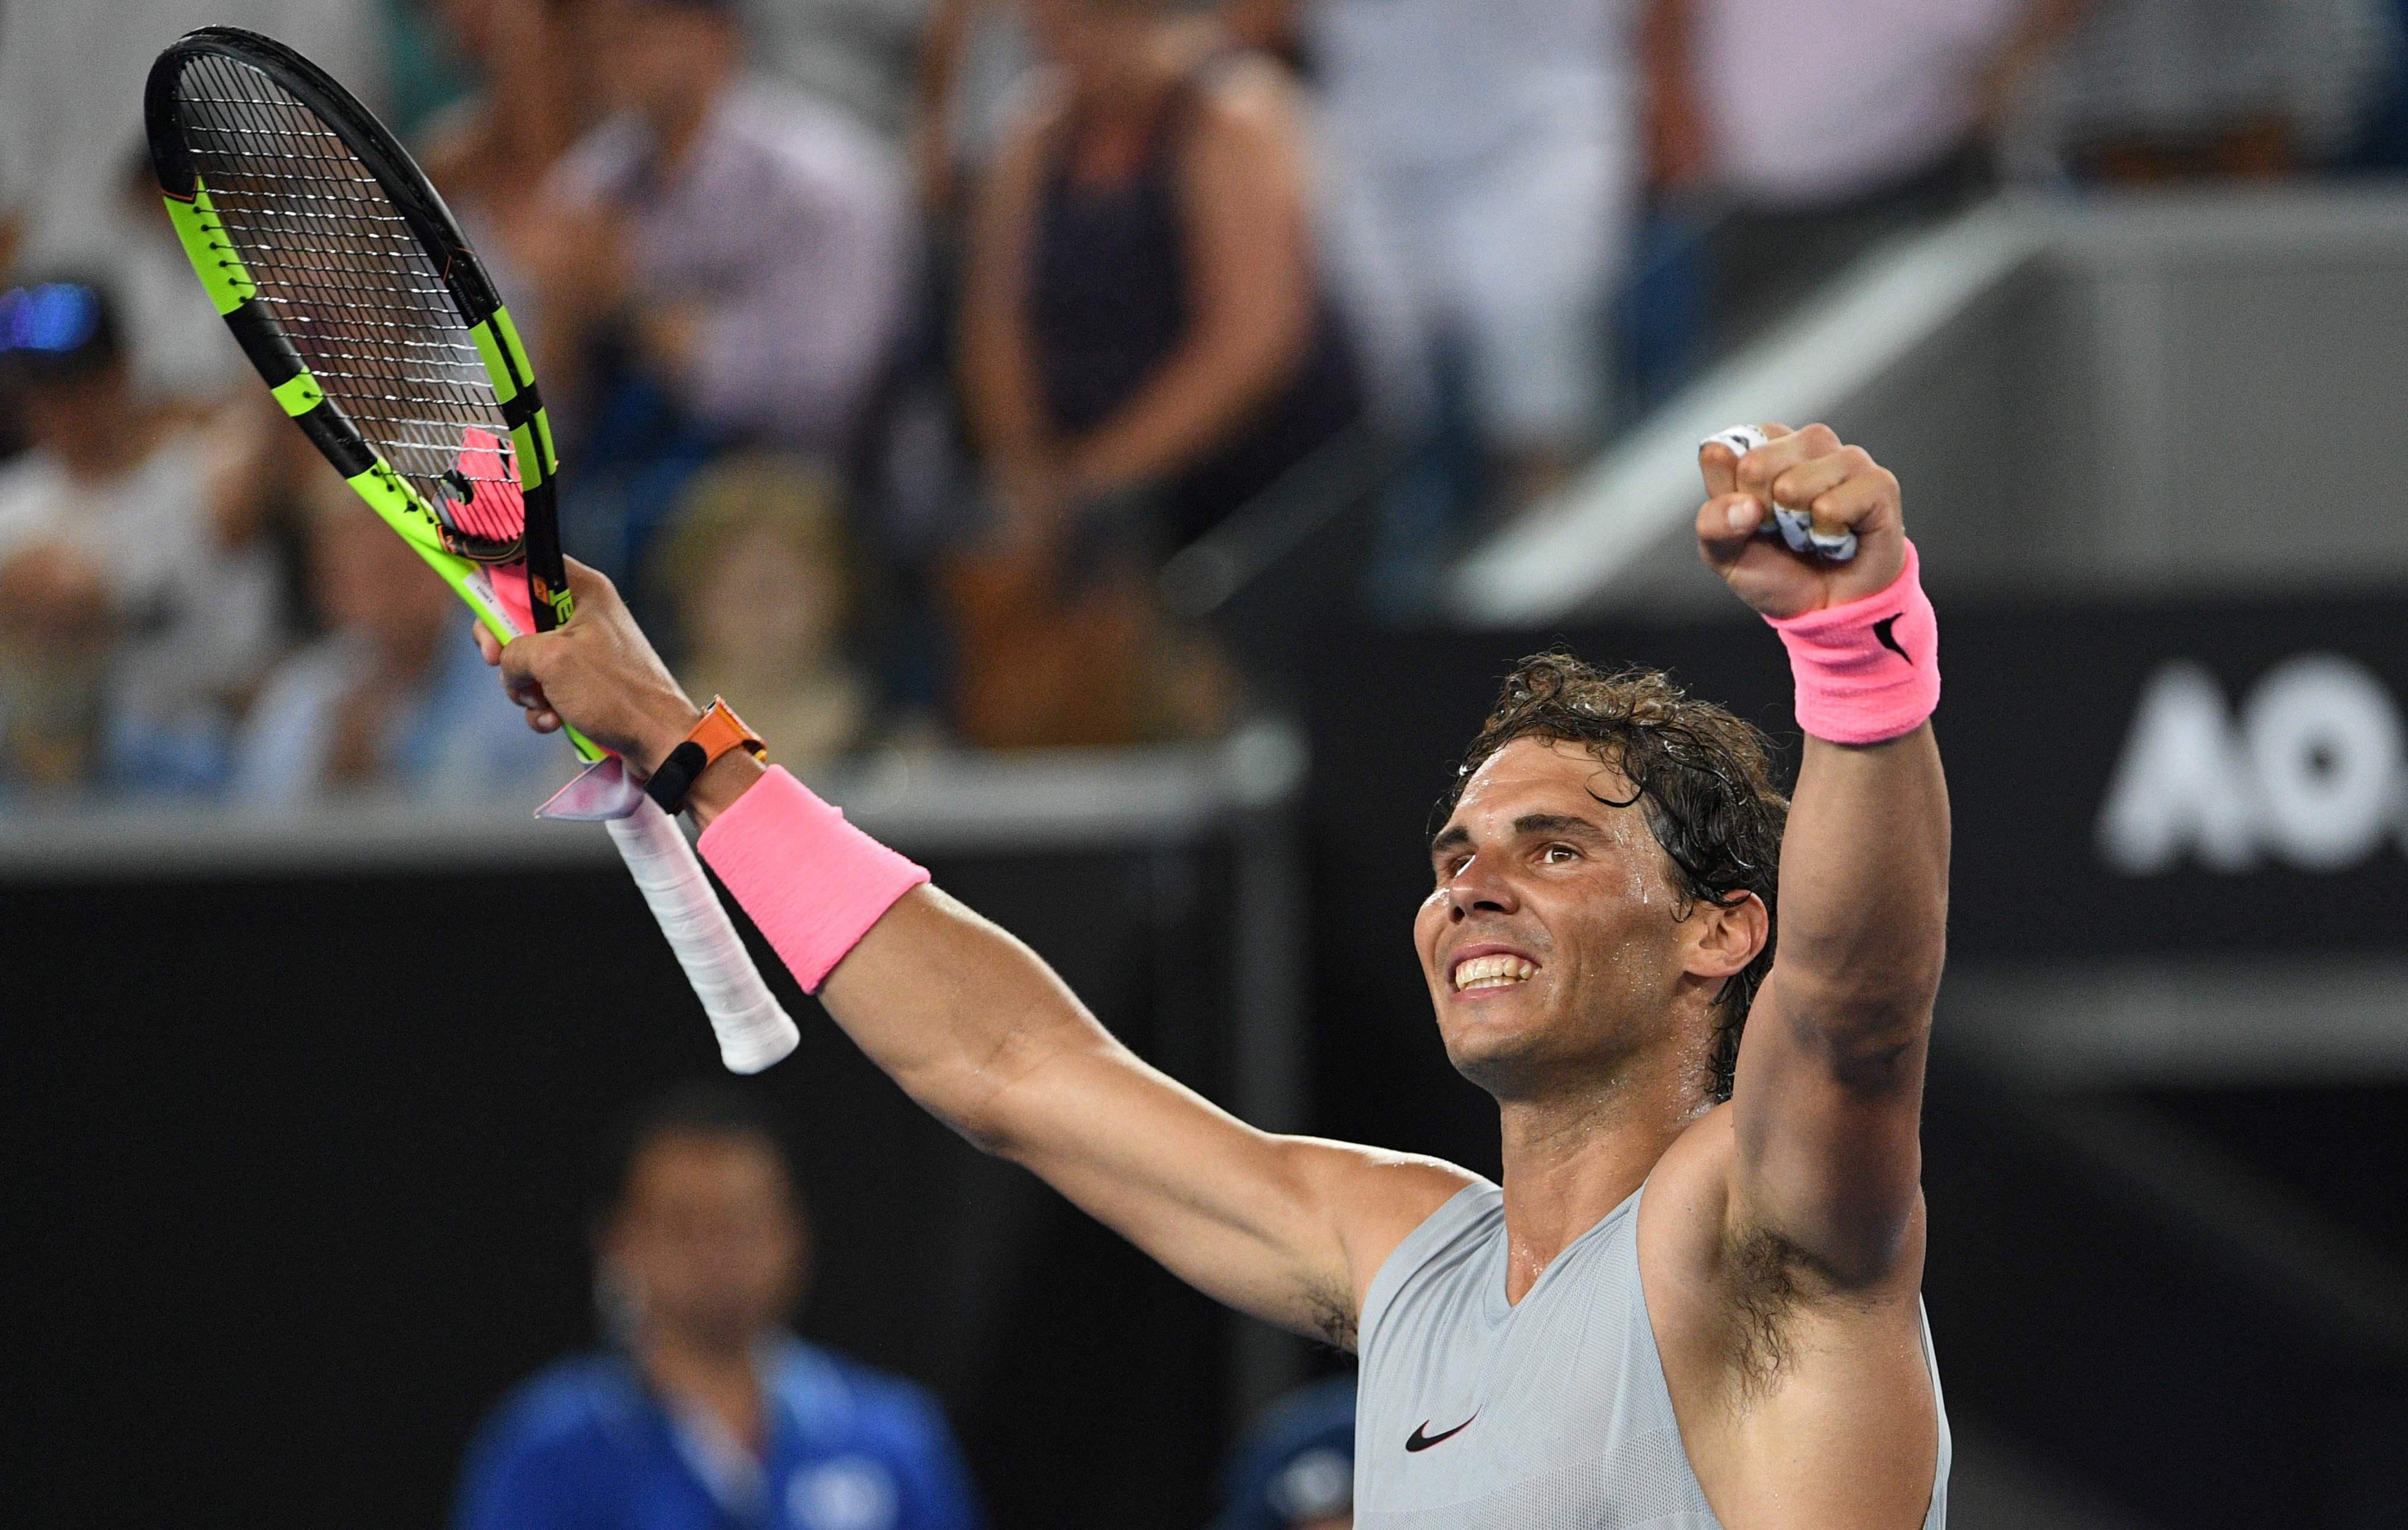 Rafael Nadal stormed past Damir Dzumhur at the Australian Open